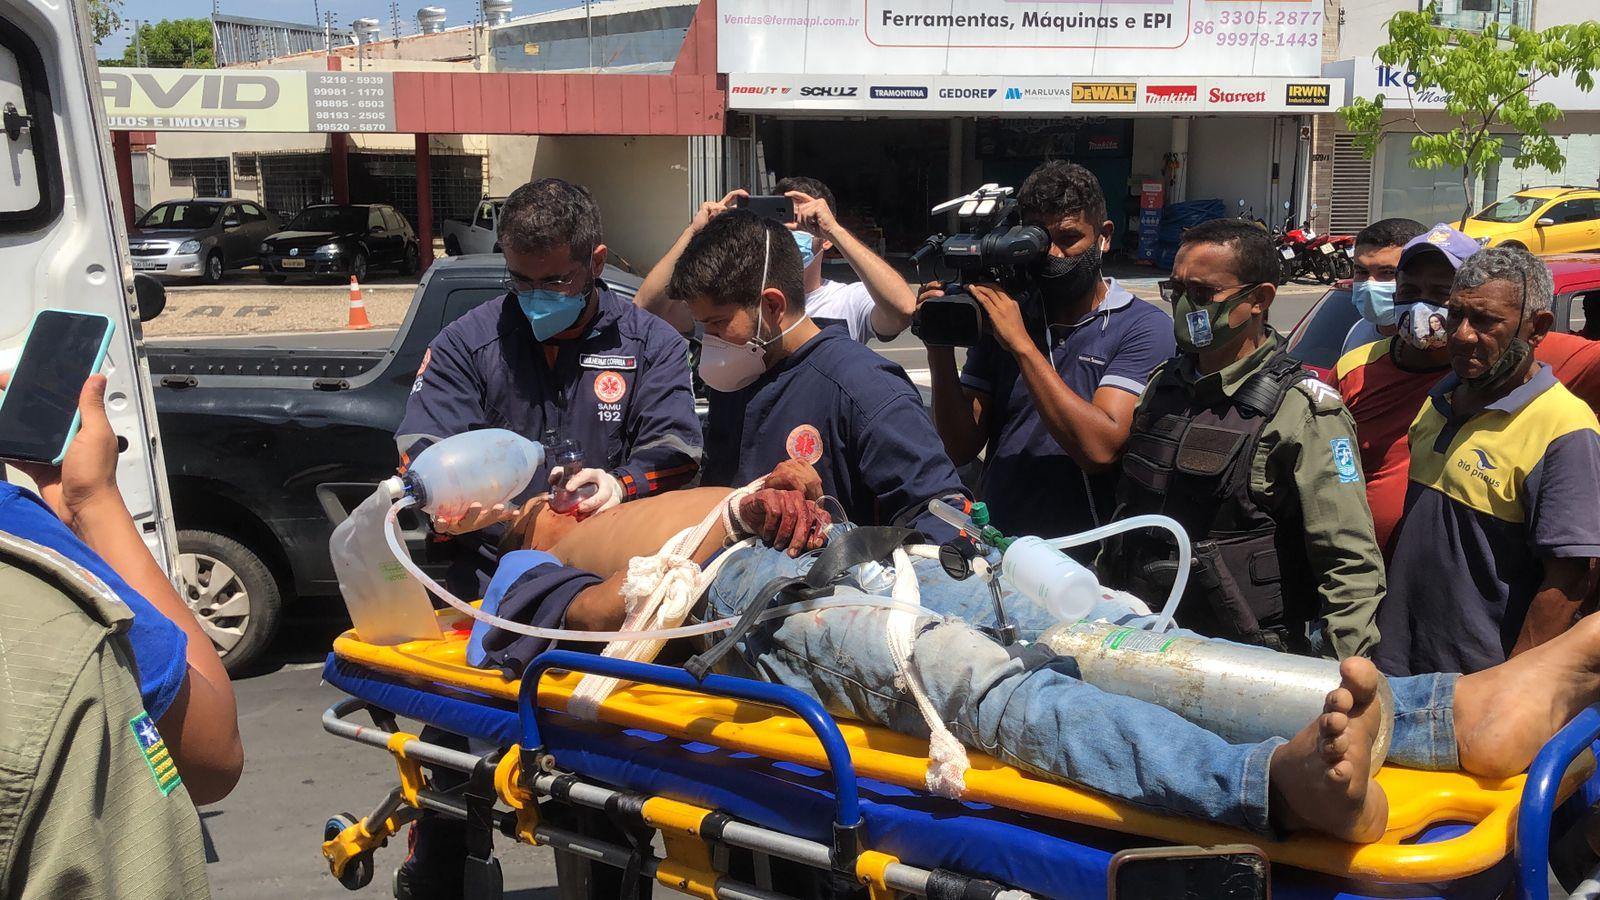 Bandido foi baleado durante tentativa de assalto na Avenida Miguel Rosa - Foto: Matheus Oliveira